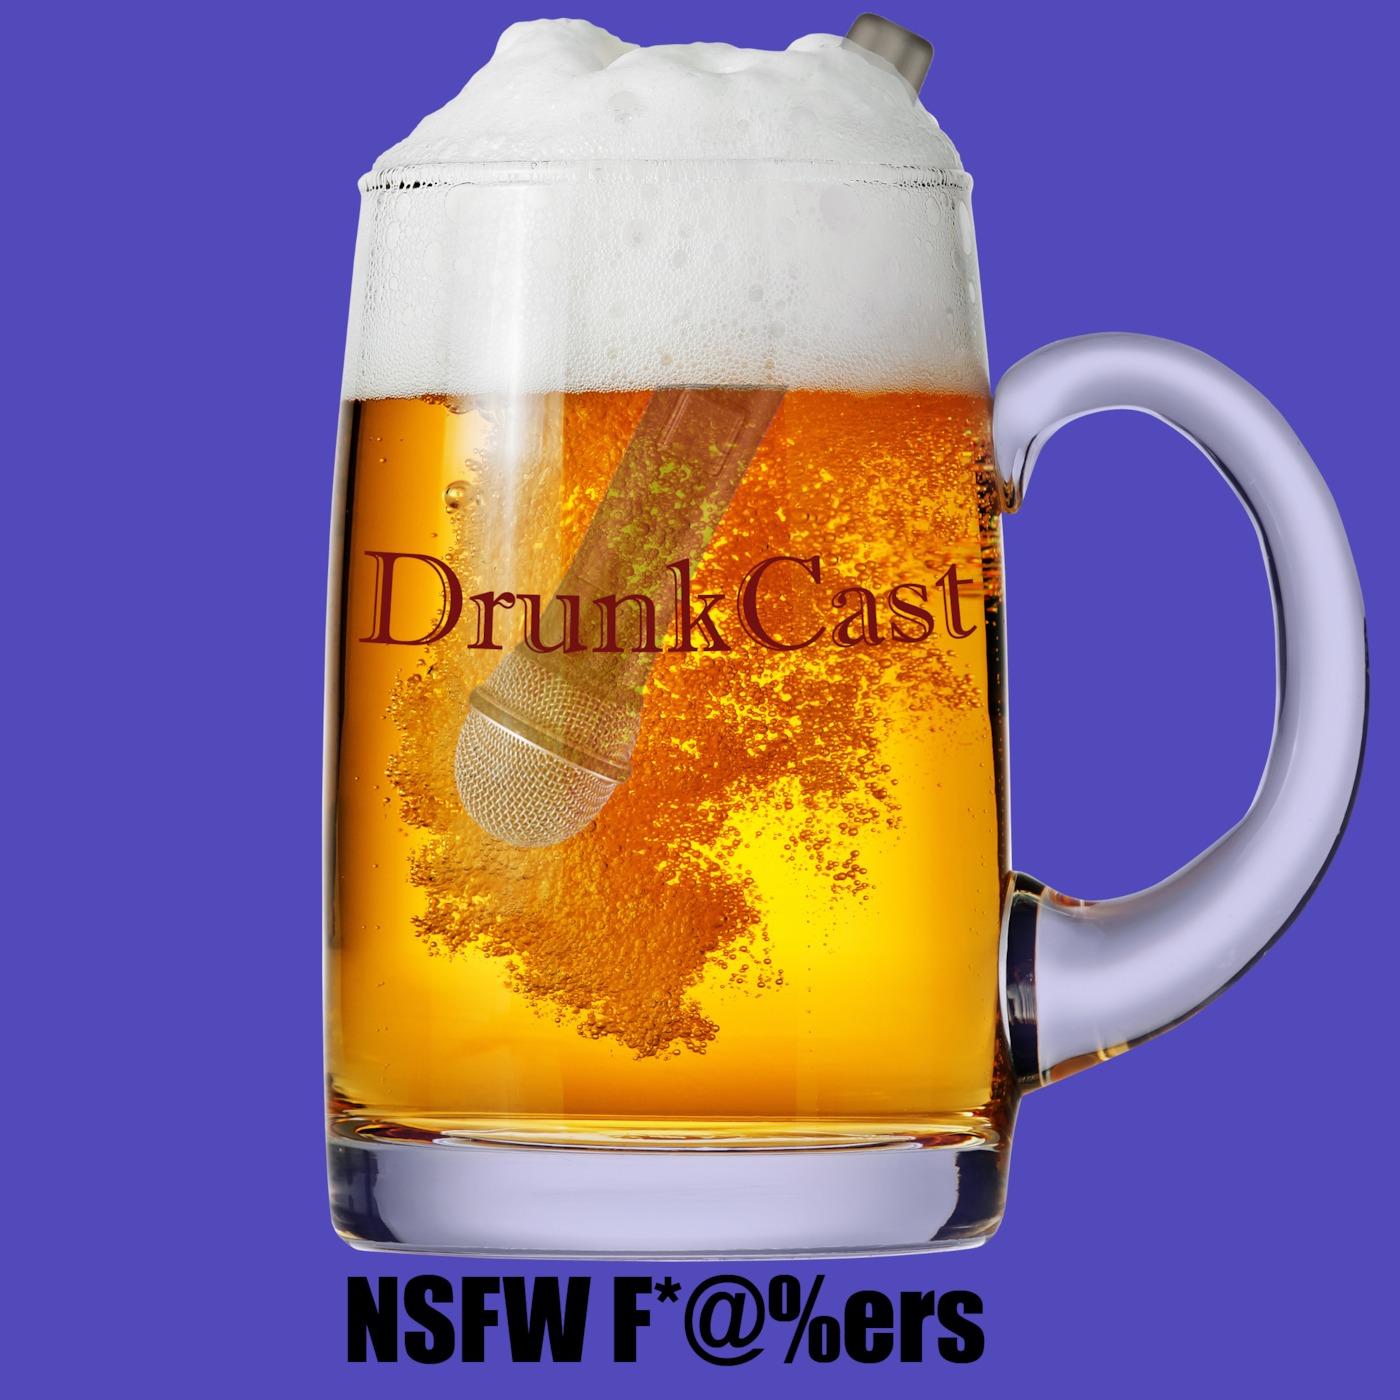 Drunkcast